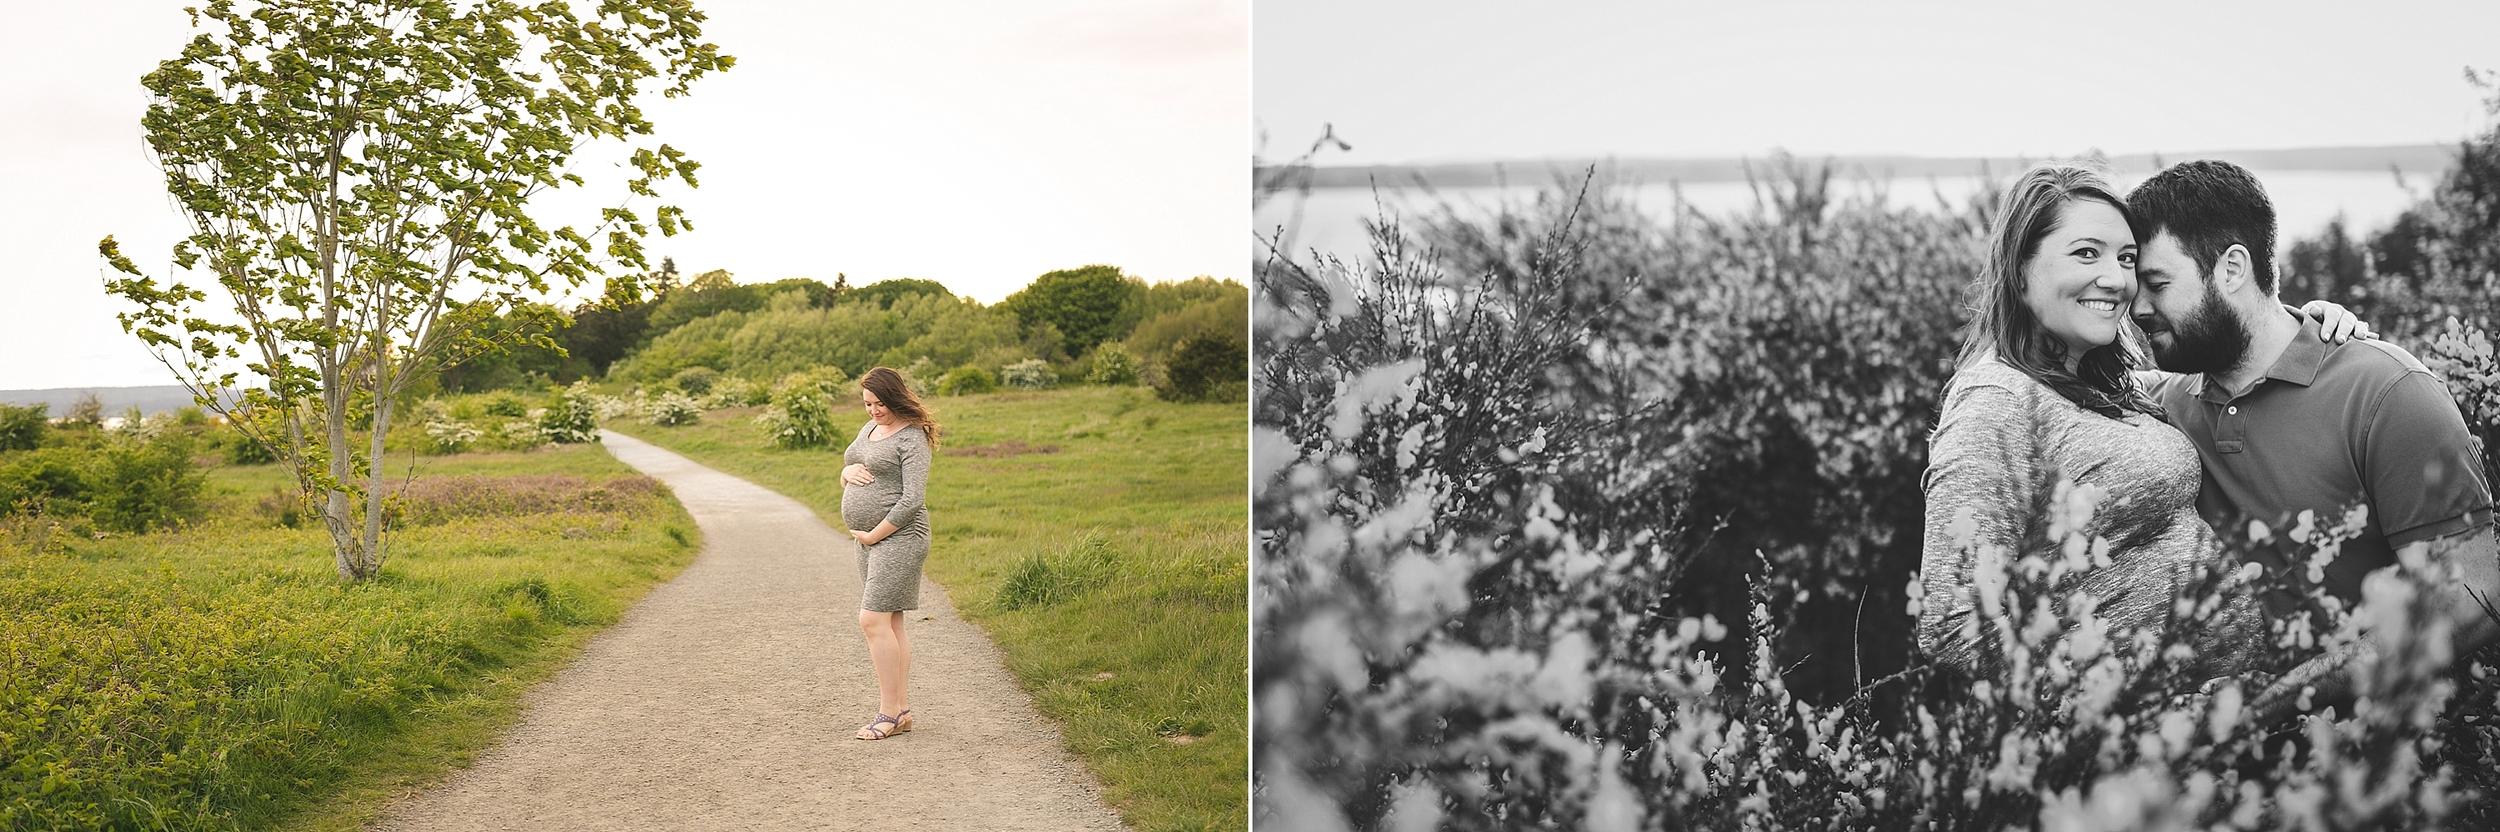 ashley vos photography seattle area lifestyle maternity photographer_0474.jpg